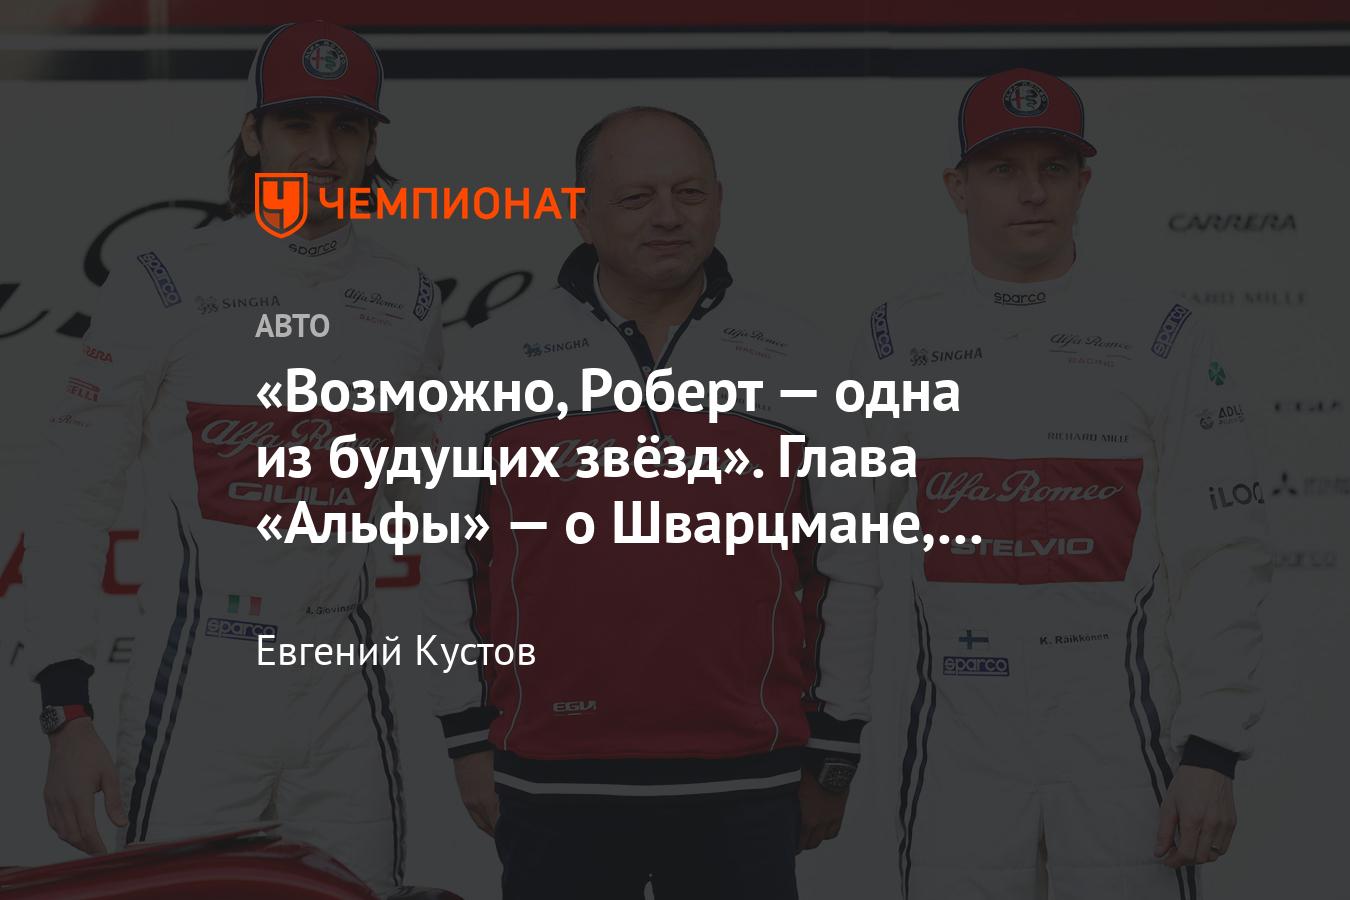 www.championat.com